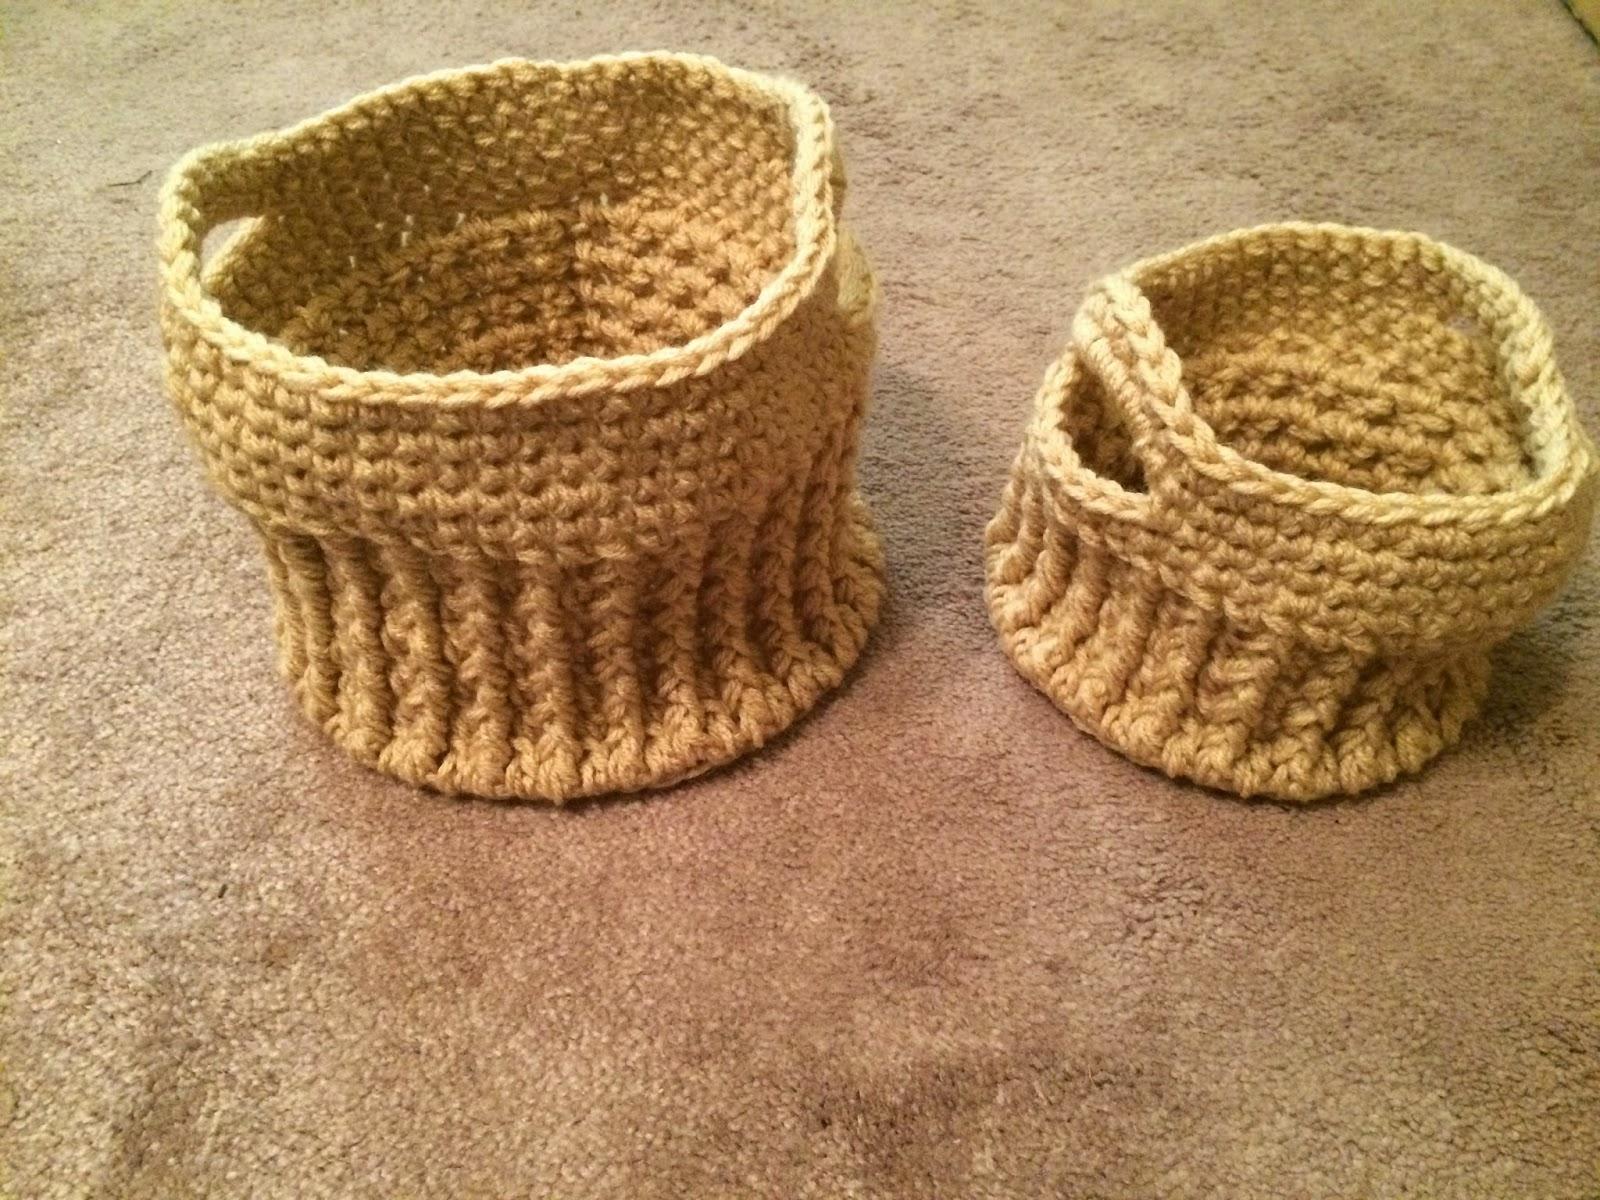 Crochet Patterns Galore - Stash Busting Texture Basket